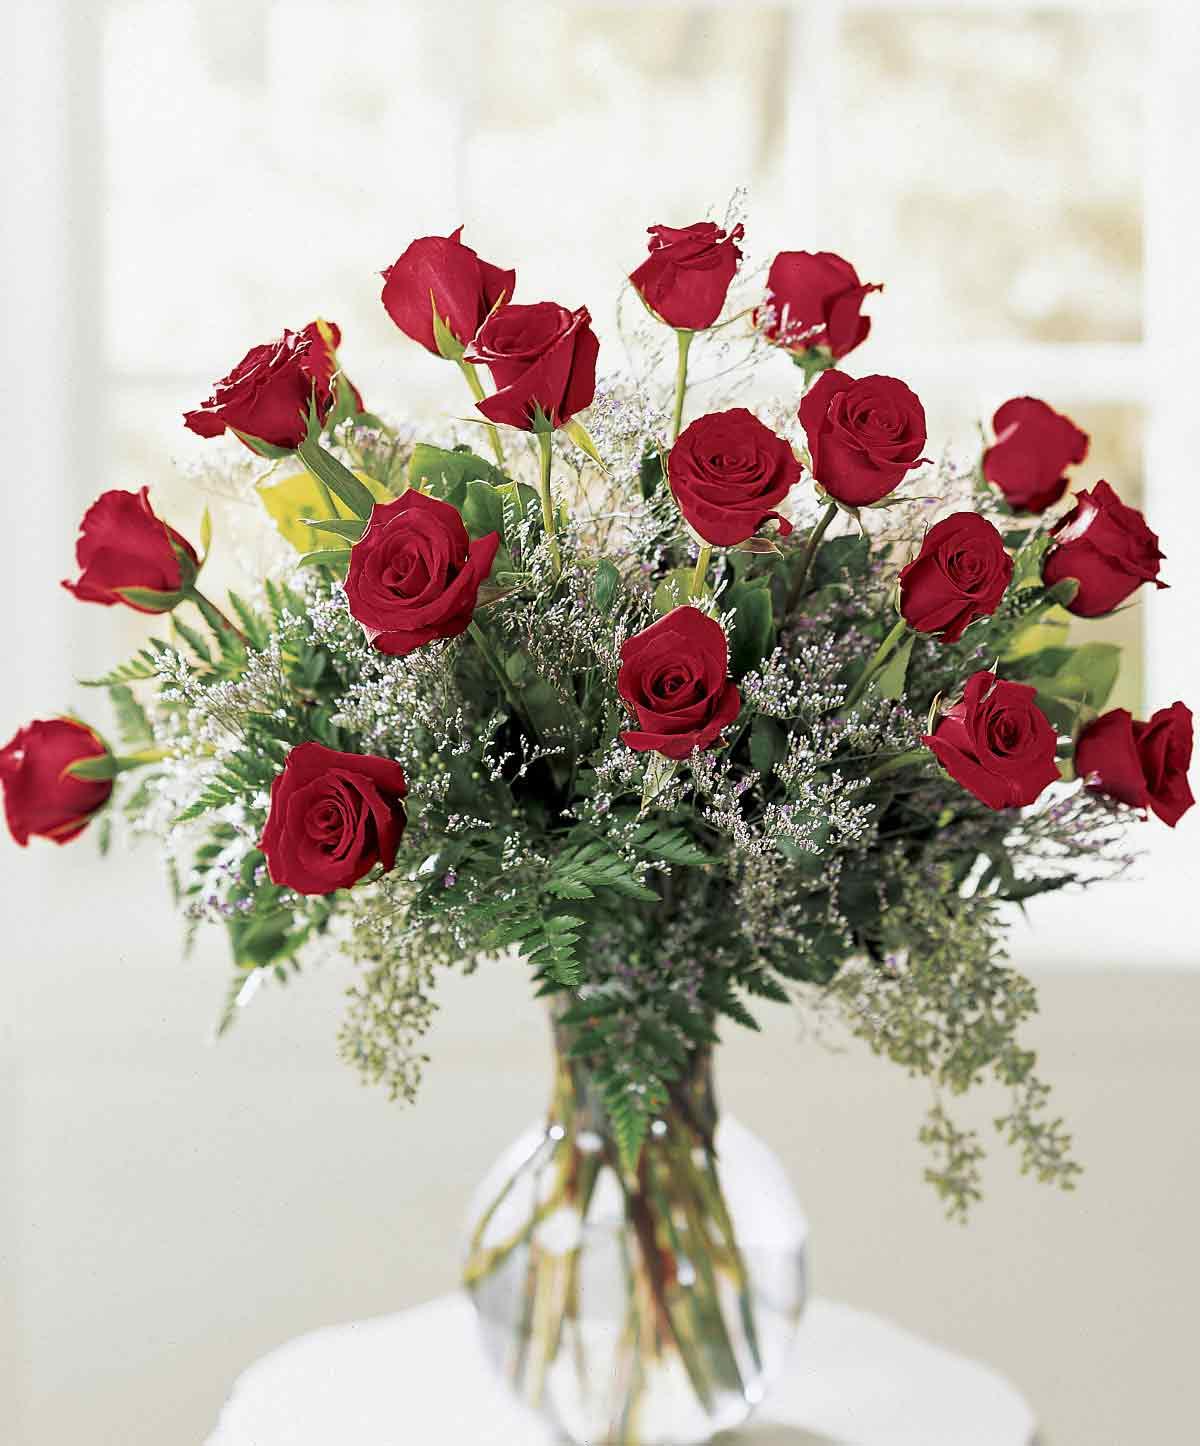 Flowers planets beautiful flowers roses beautiful flowers roses izmirmasajfo